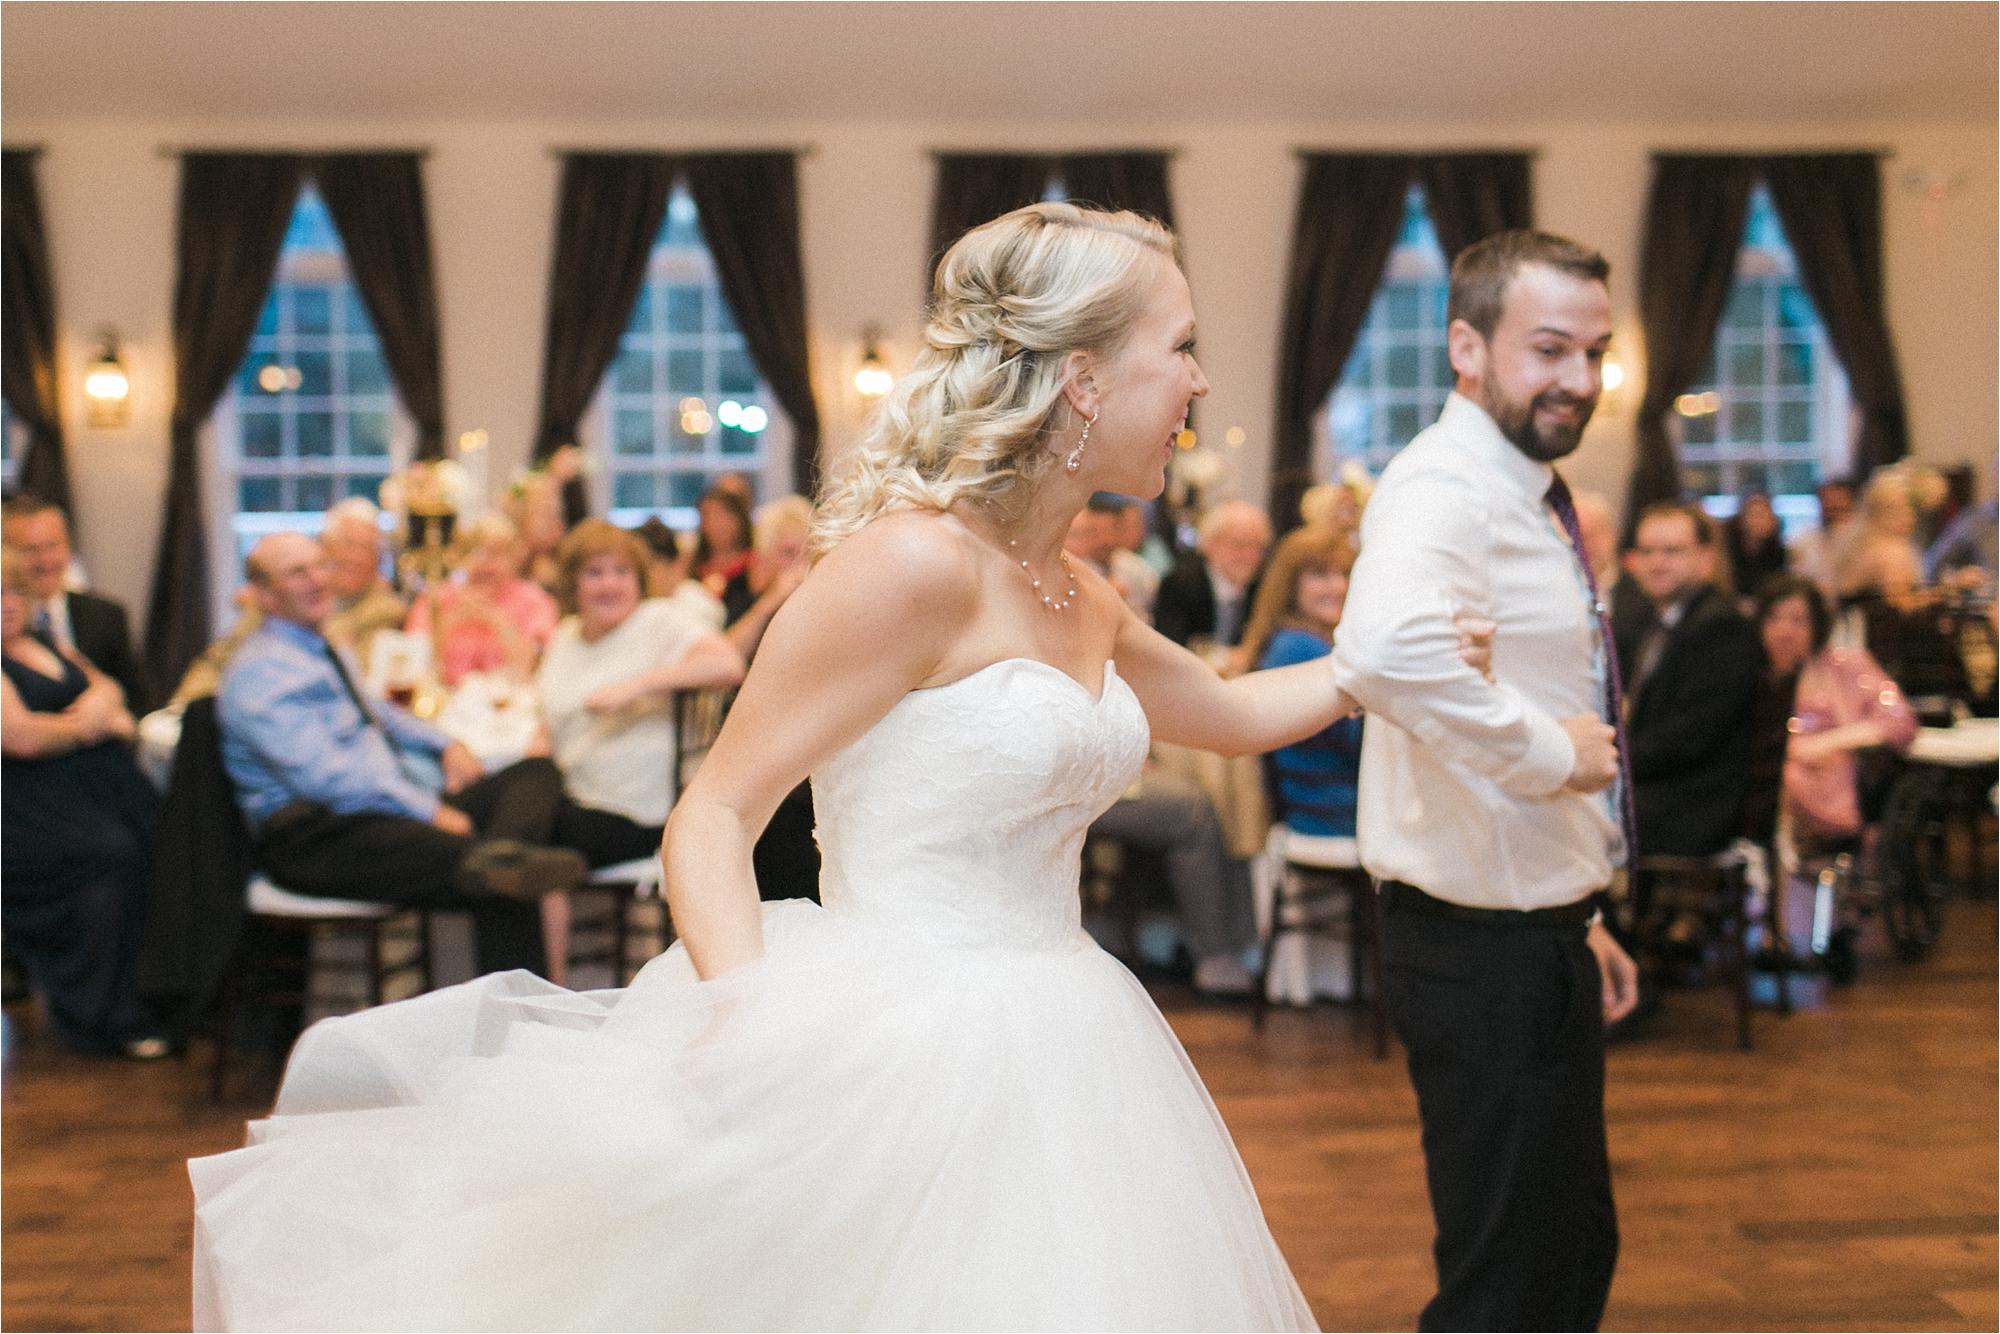 fredericksburg-virginia-stevenson-ridge-wedding-stephanie-yonce-photo_0054.jpg